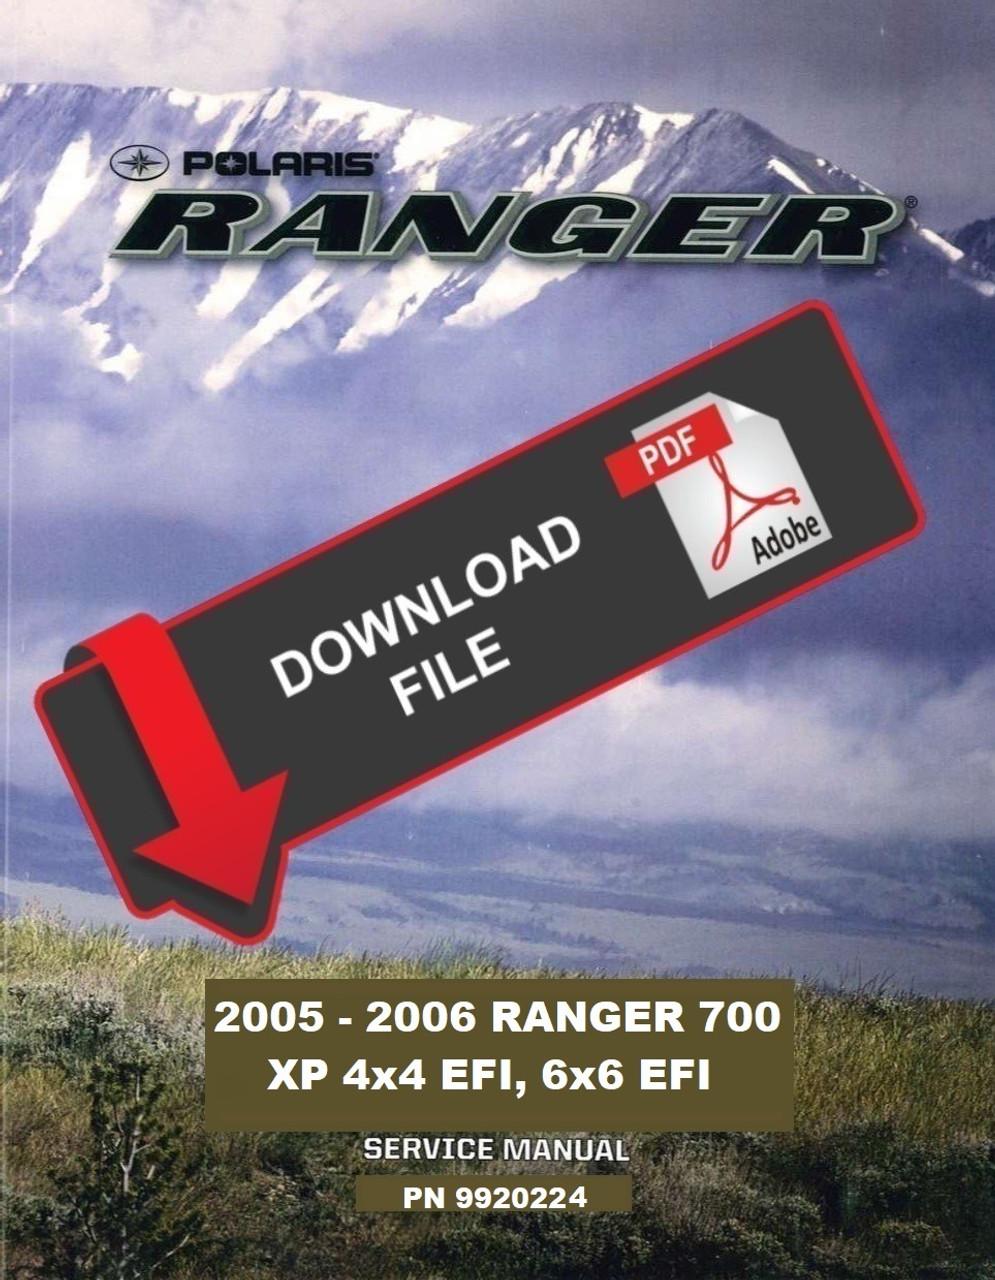 small resolution of  polaris 2005 ranger xp 4x4 service manual on polaris ranger rzr 800 kawasaki teryx 750